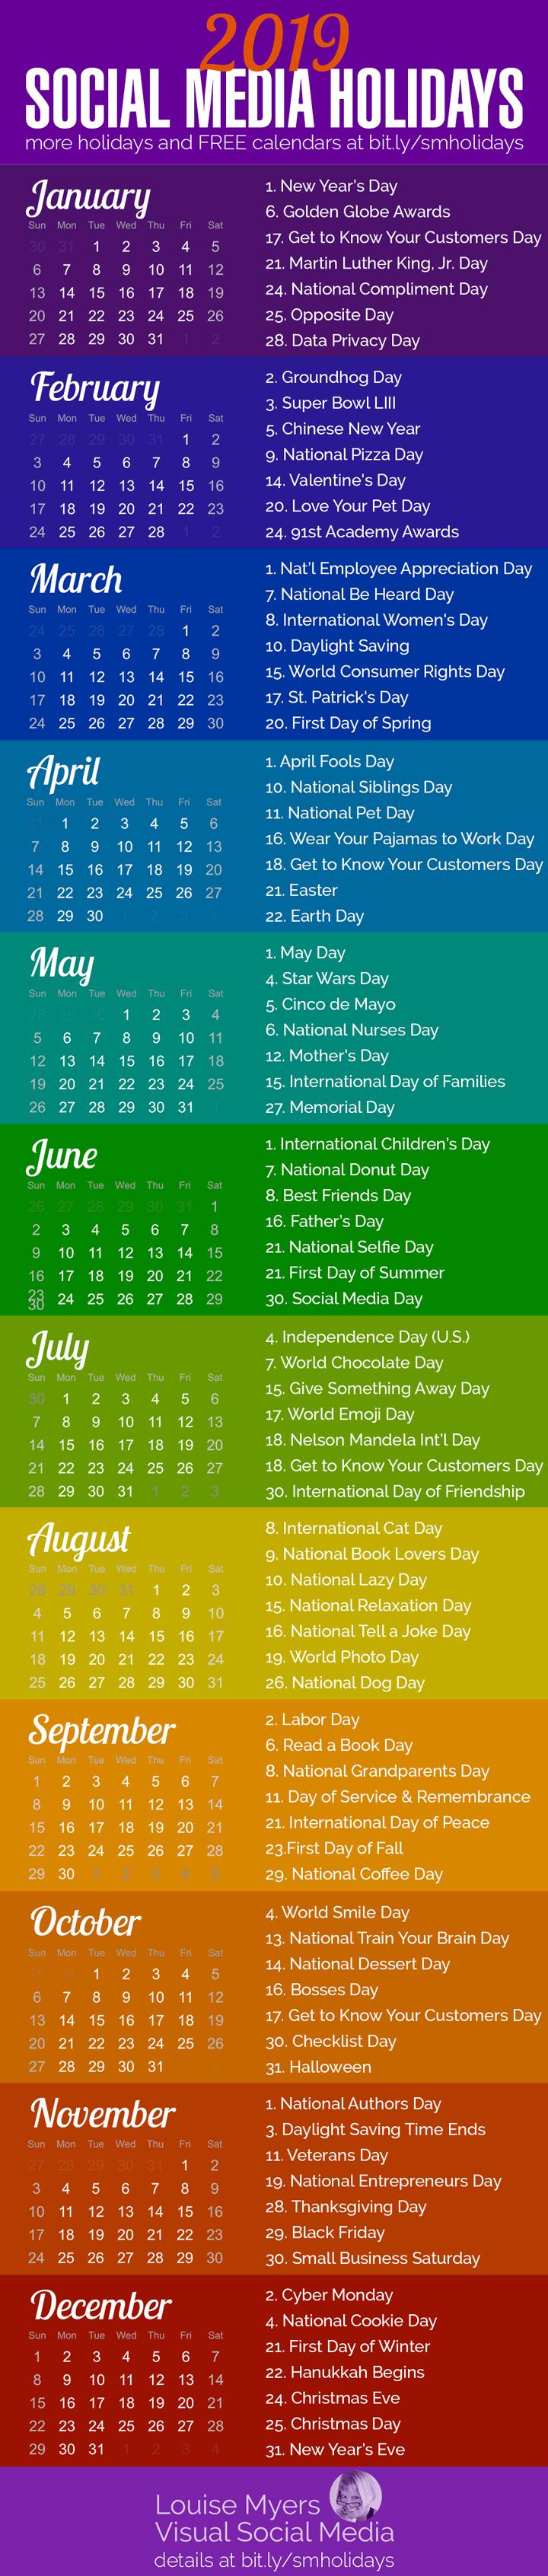 100 Social Media Holidays You Need In 2020 21 Indispensable Social Media Calendar Social Media Social Media Marketing